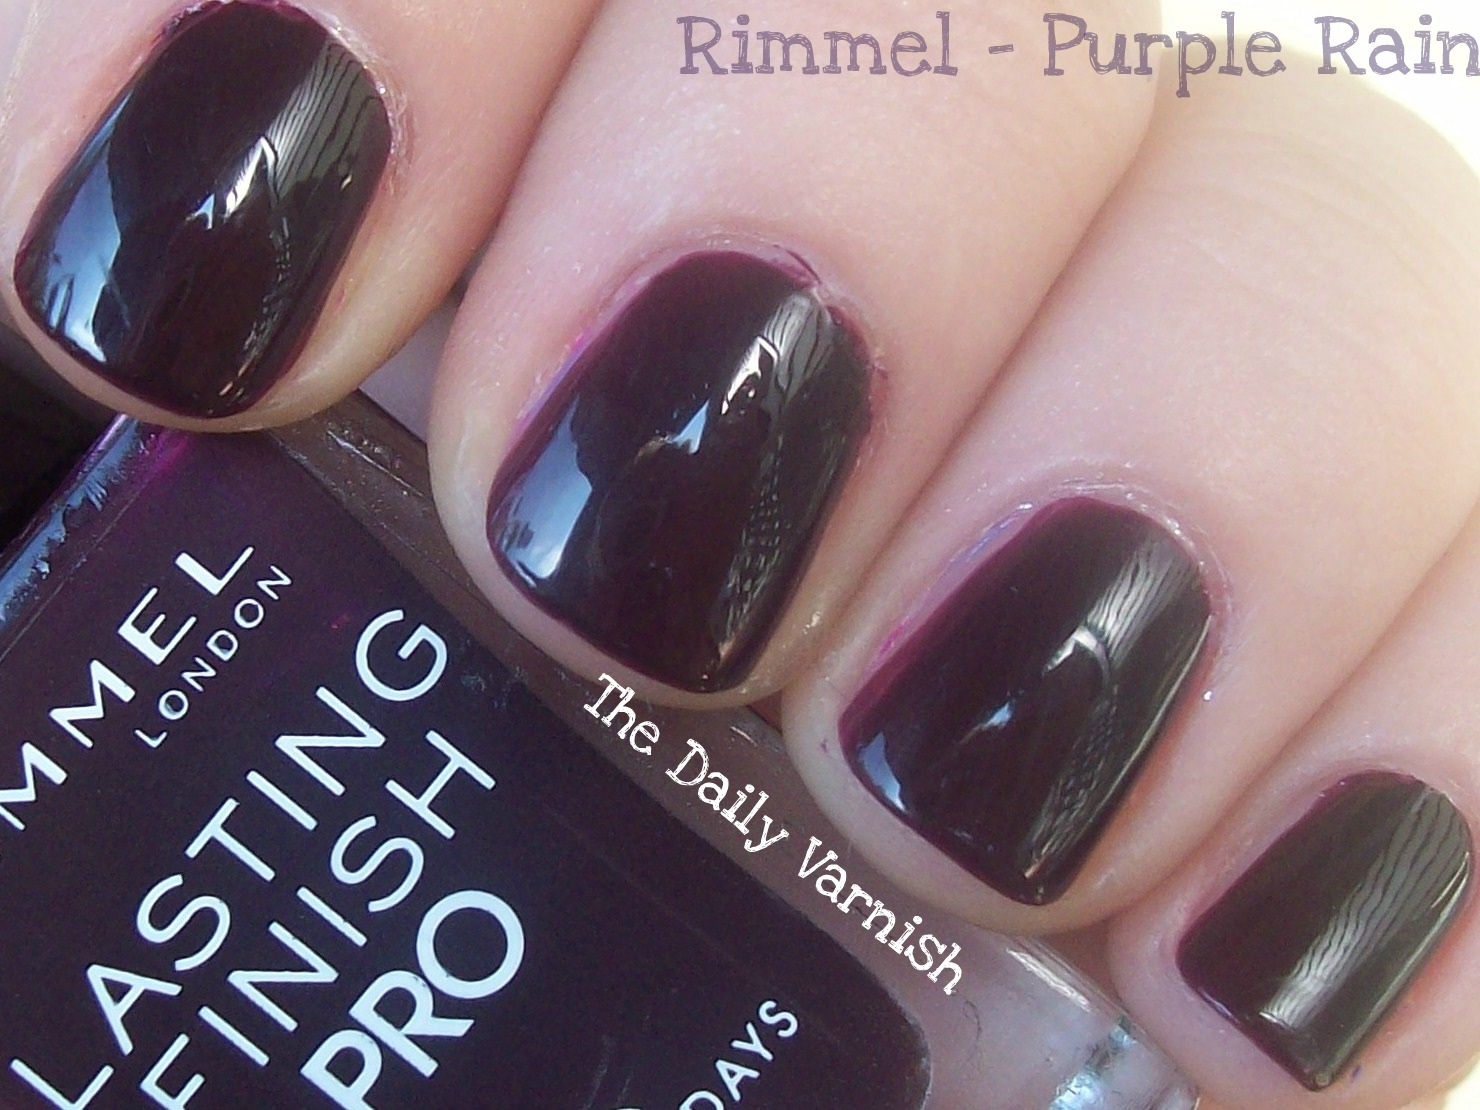 Rimmel – Purple Rain – The Daily Varnish